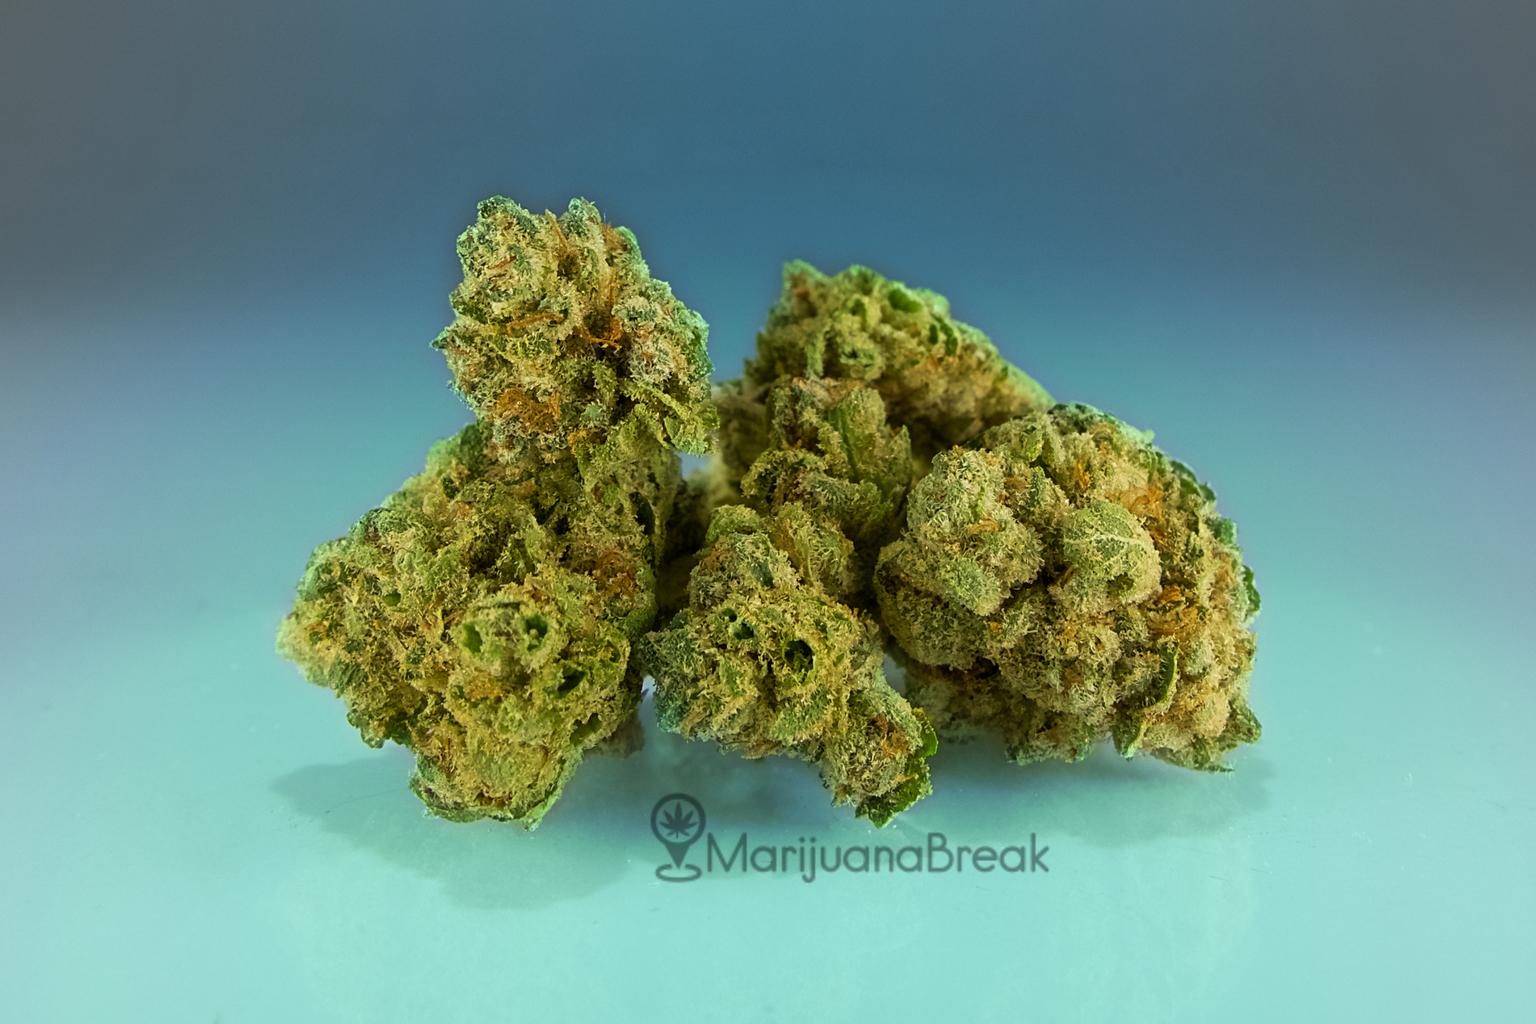 Gorilla Glue cannabis strain